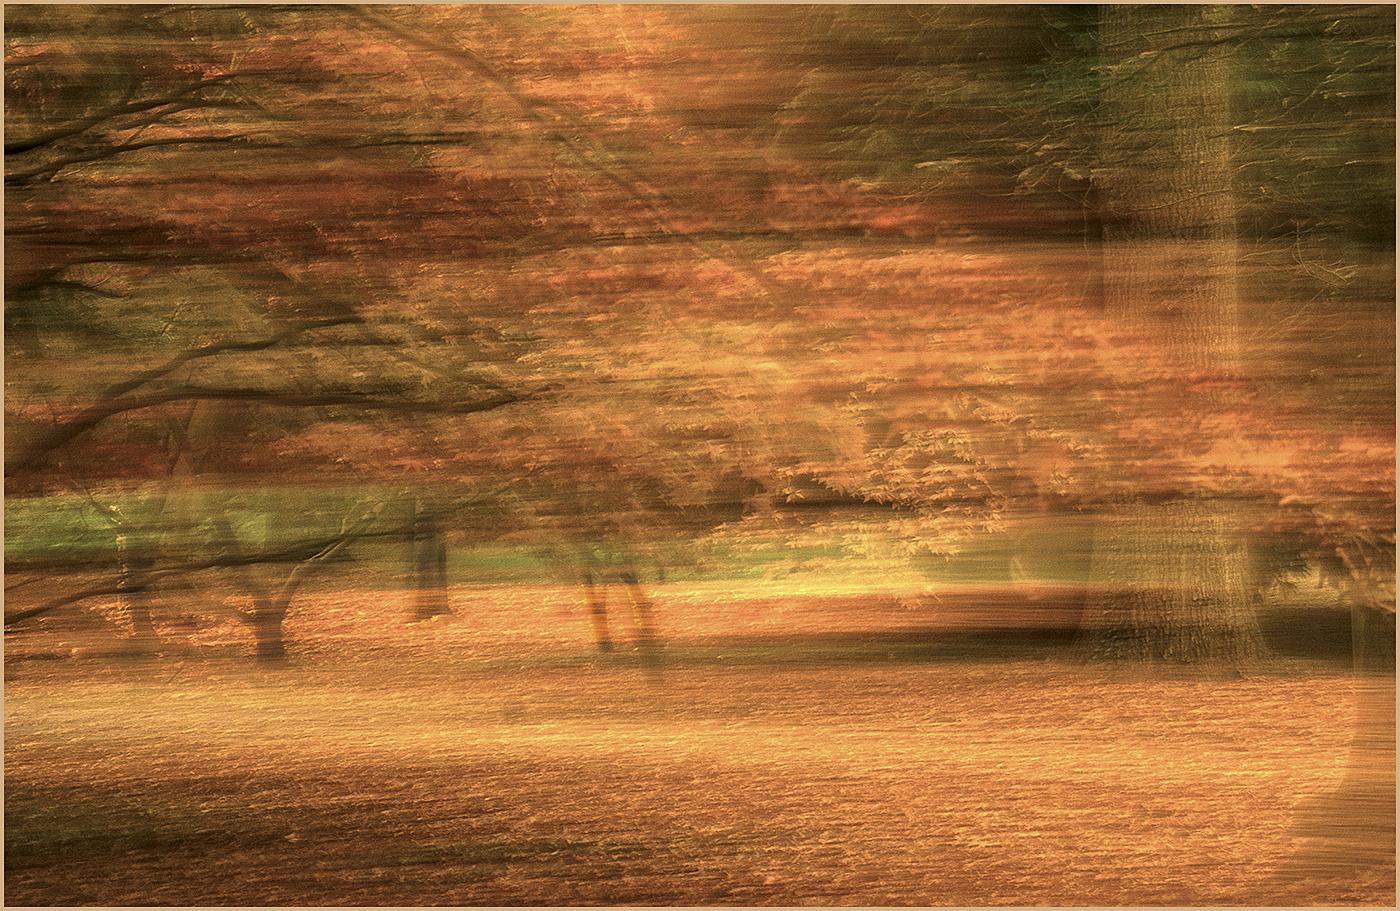 Trees at Thorpe Perrow